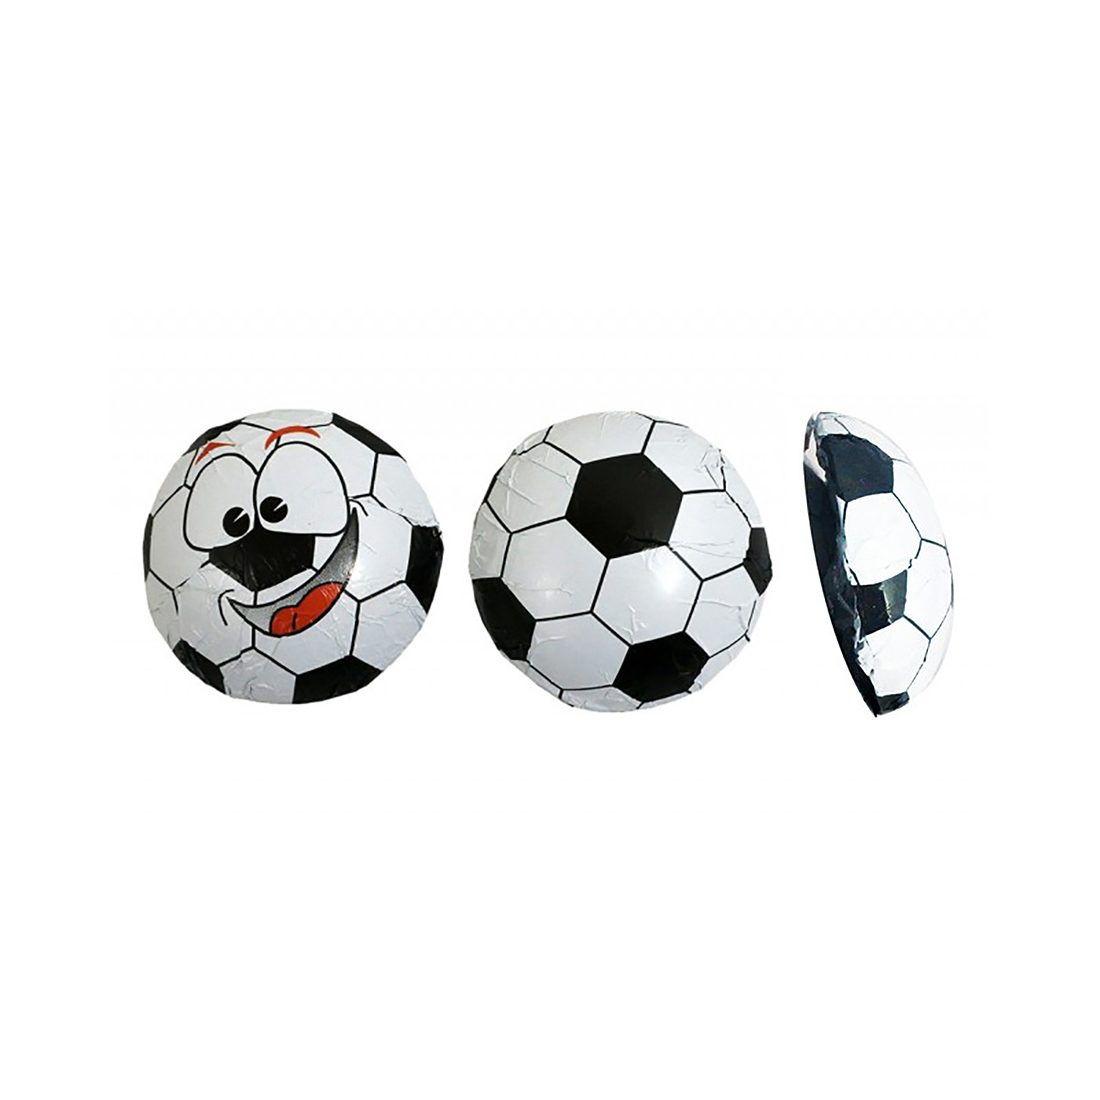 Fussball Adventskalender Selber Befullen Adventman